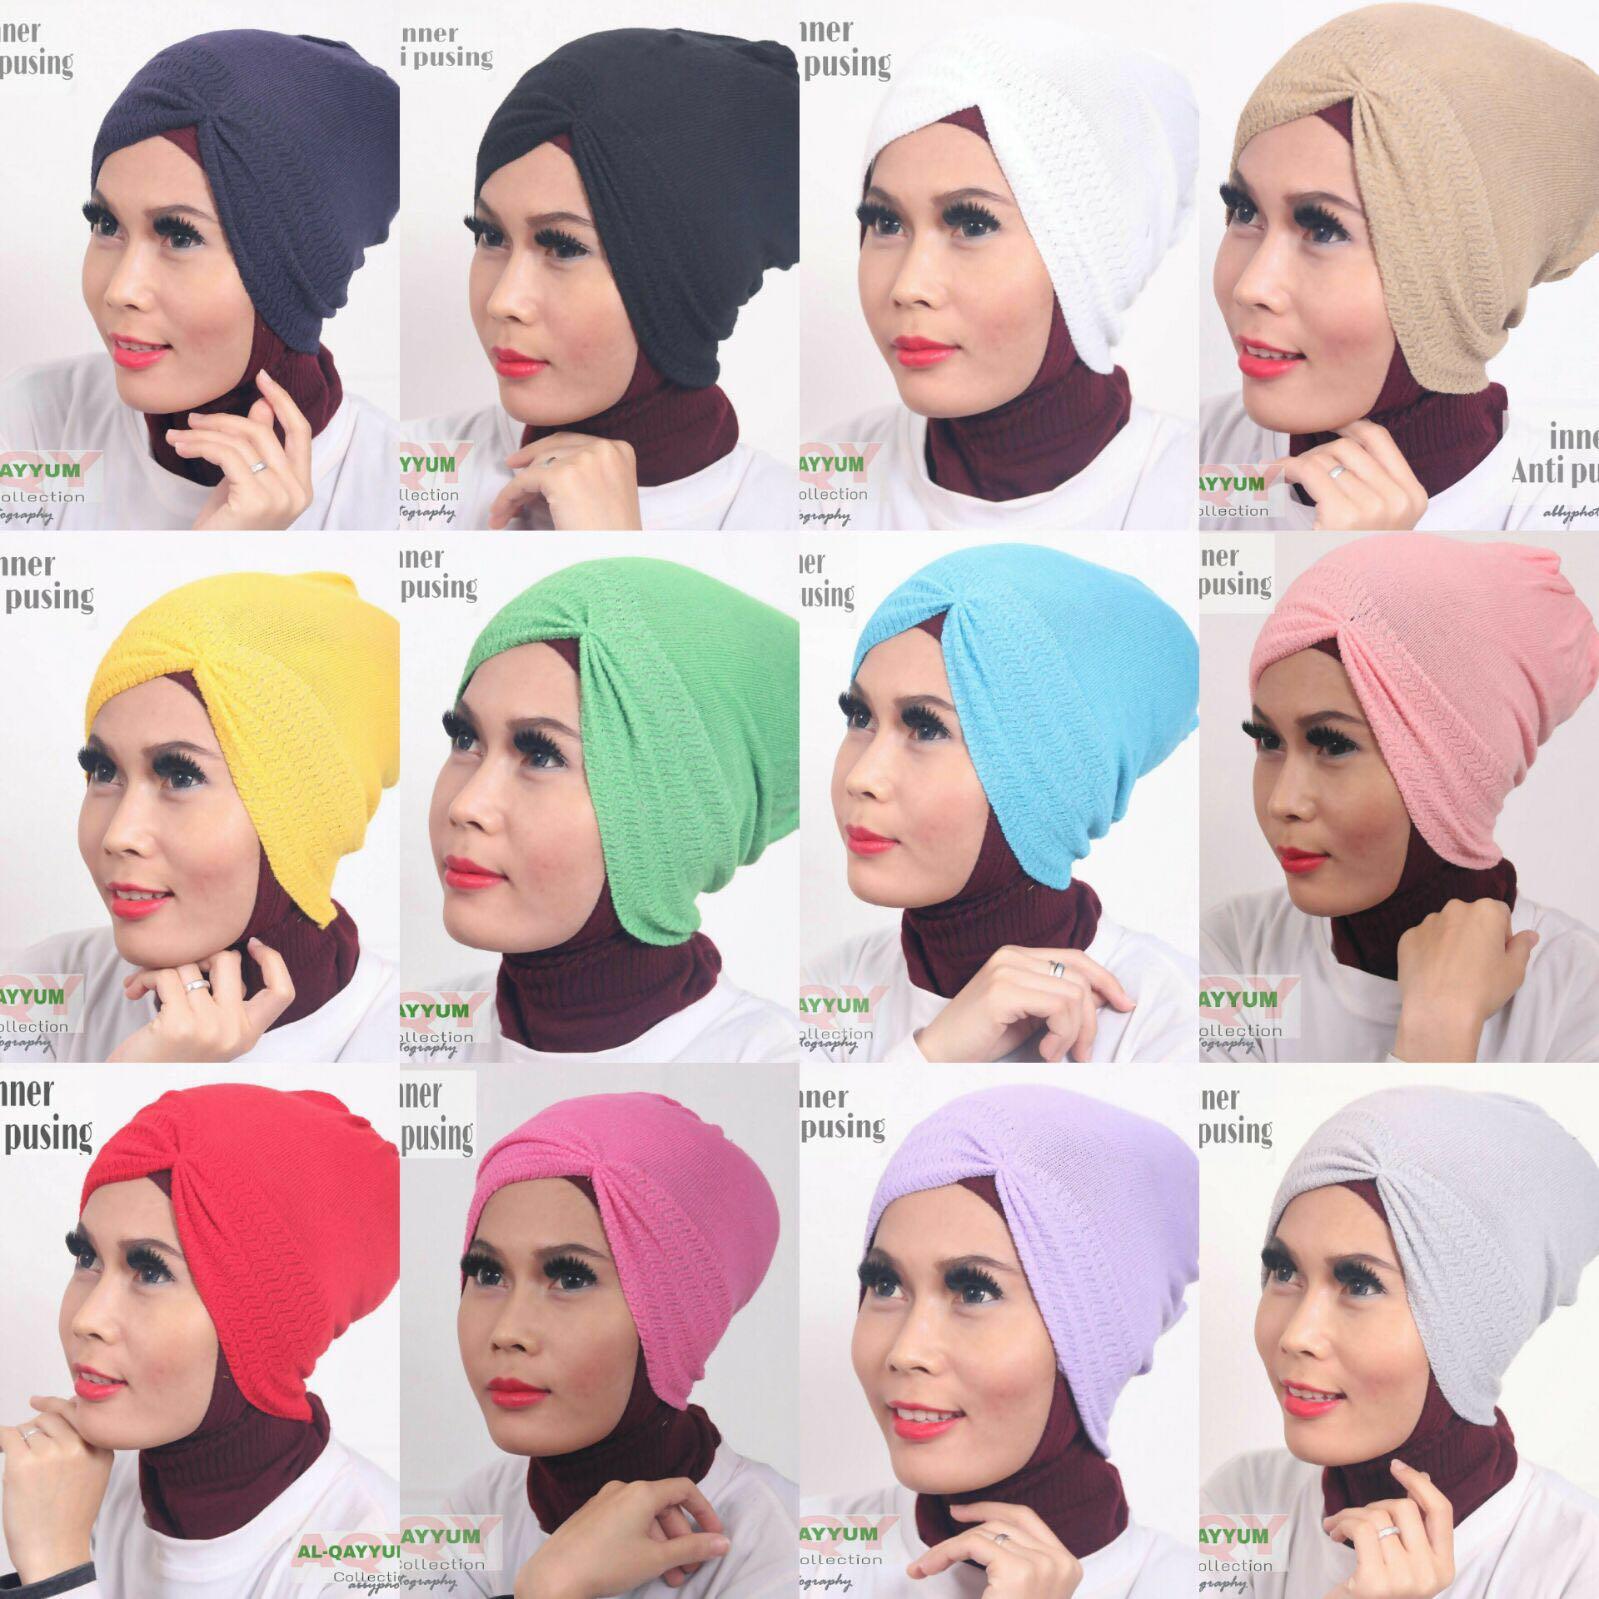 Solusi Tampil Cantik Dan Modis Sesuai Syariah Inner Anti Pusing By Umama Noor Hijab Jilbab Kerudung Segiempat Al Qayyum